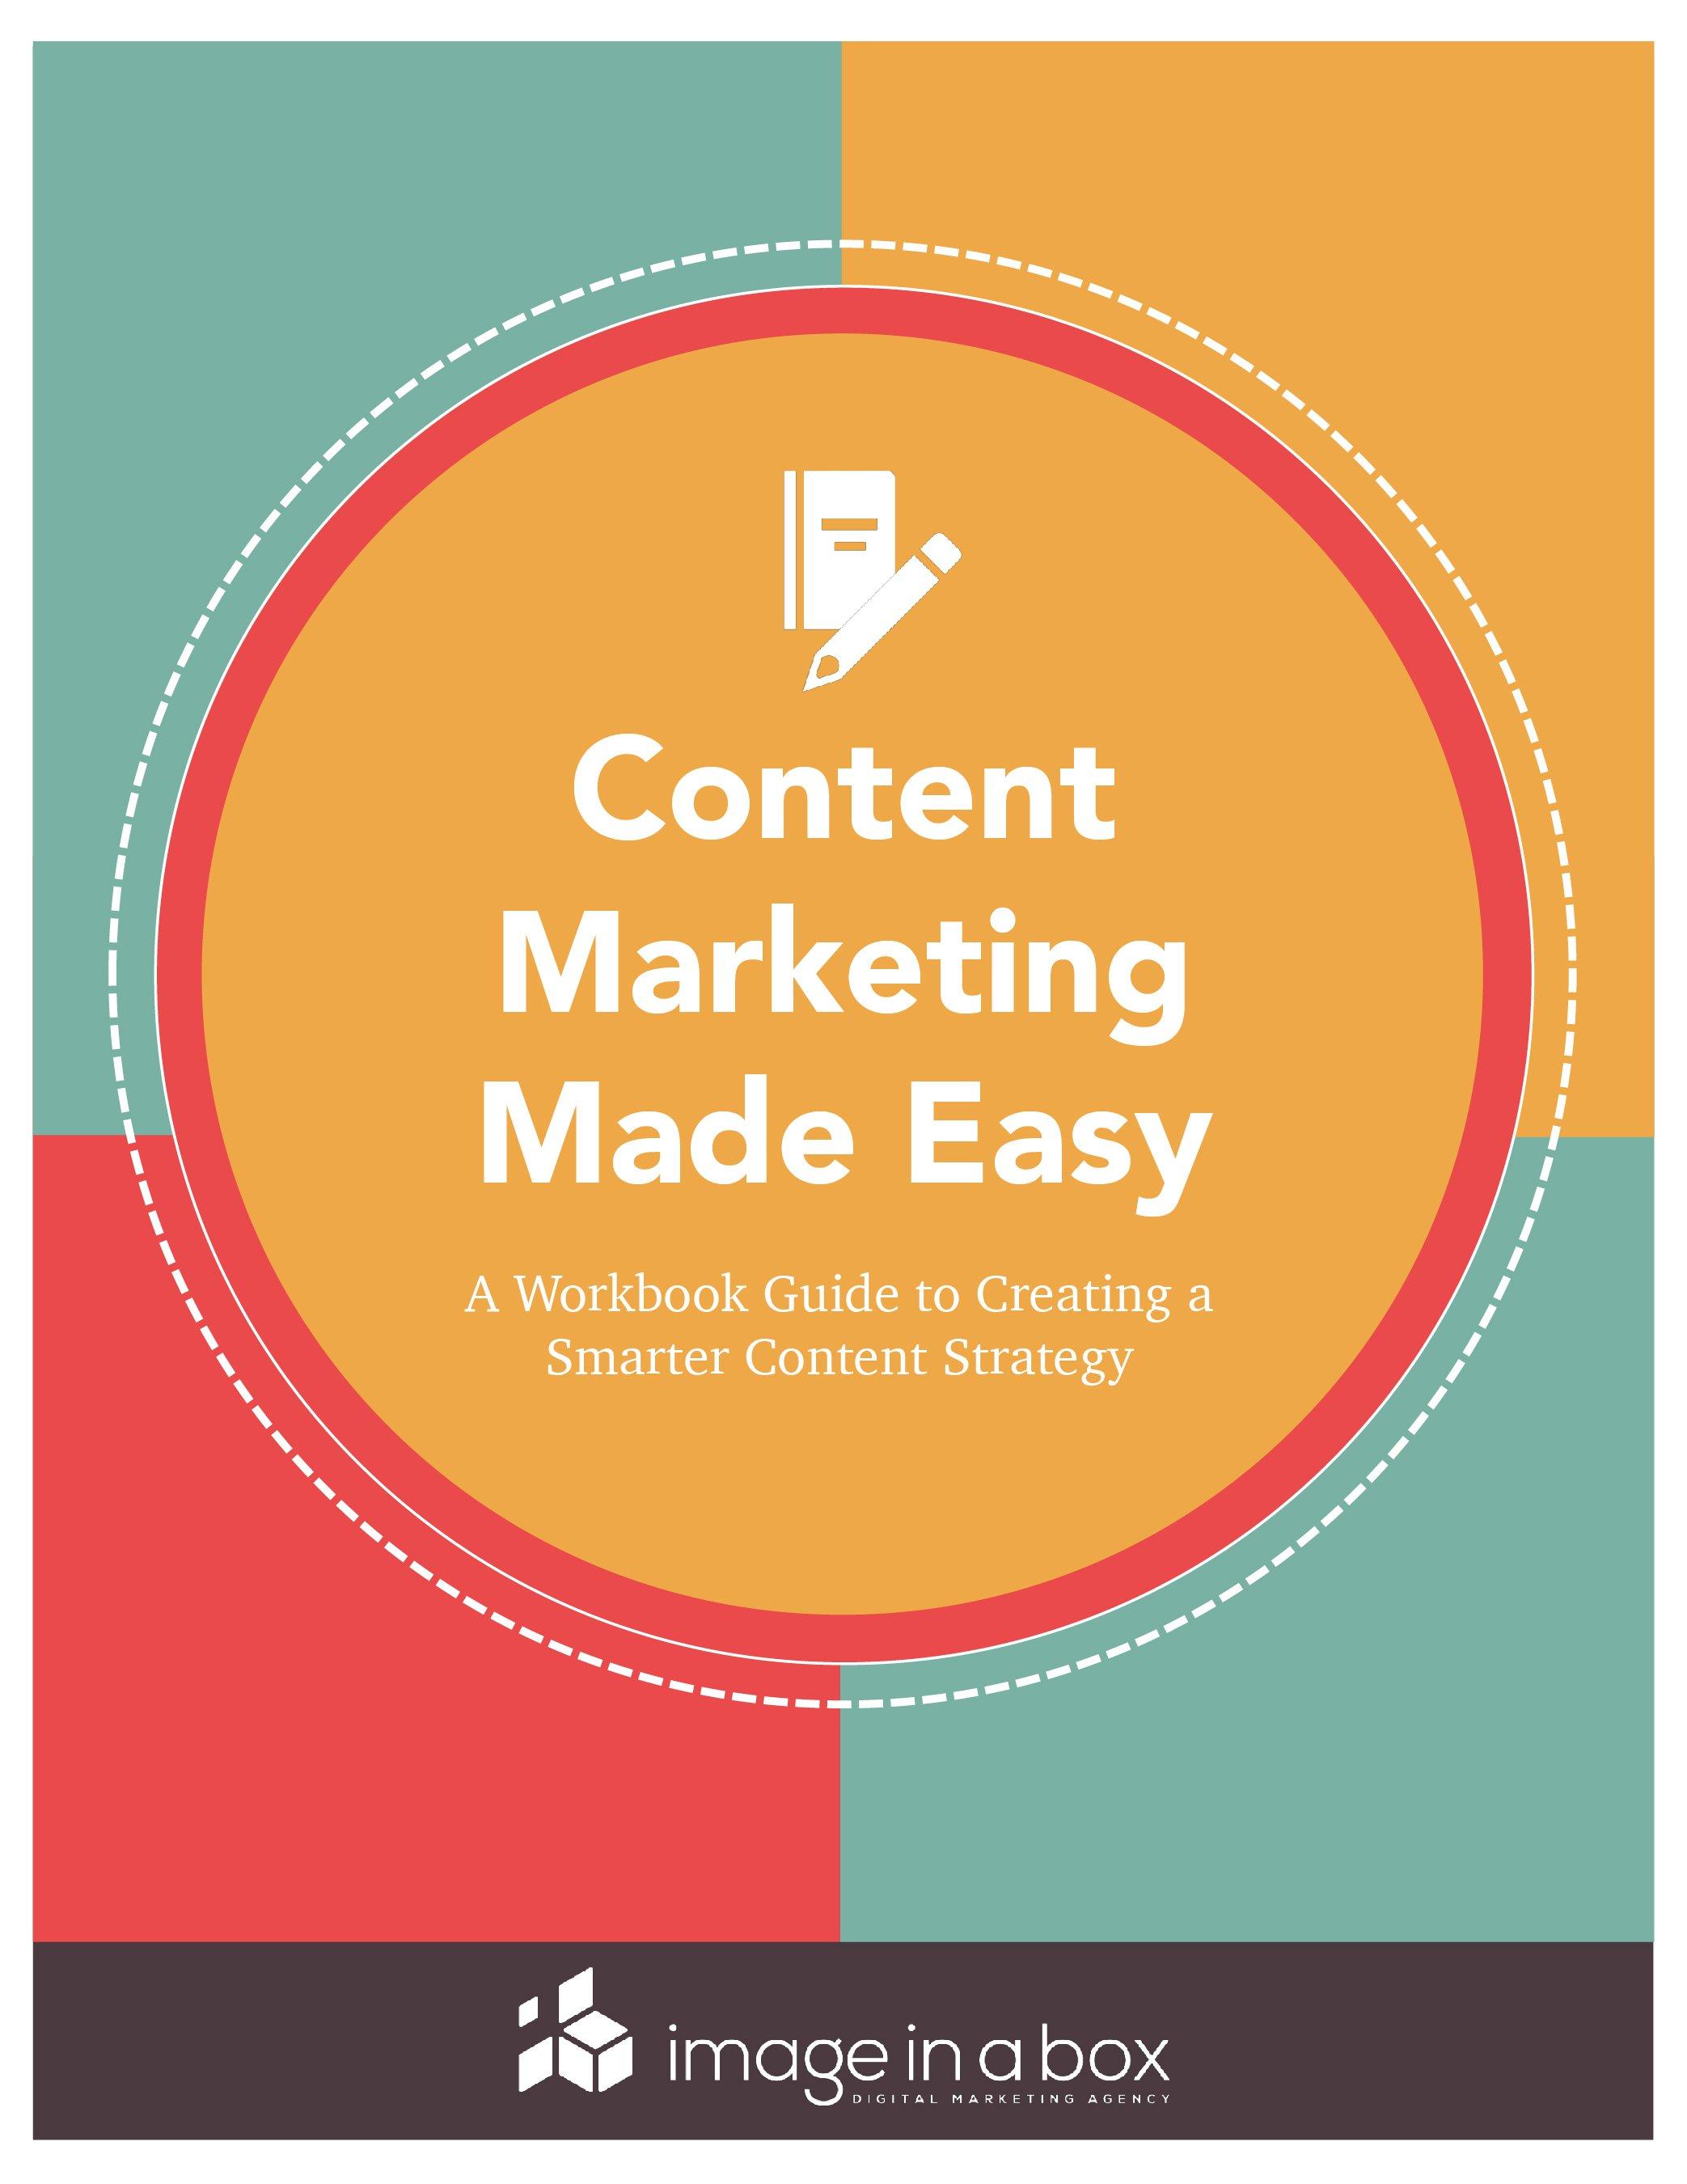 Content-Marketing-Workbook-Cover.jpg